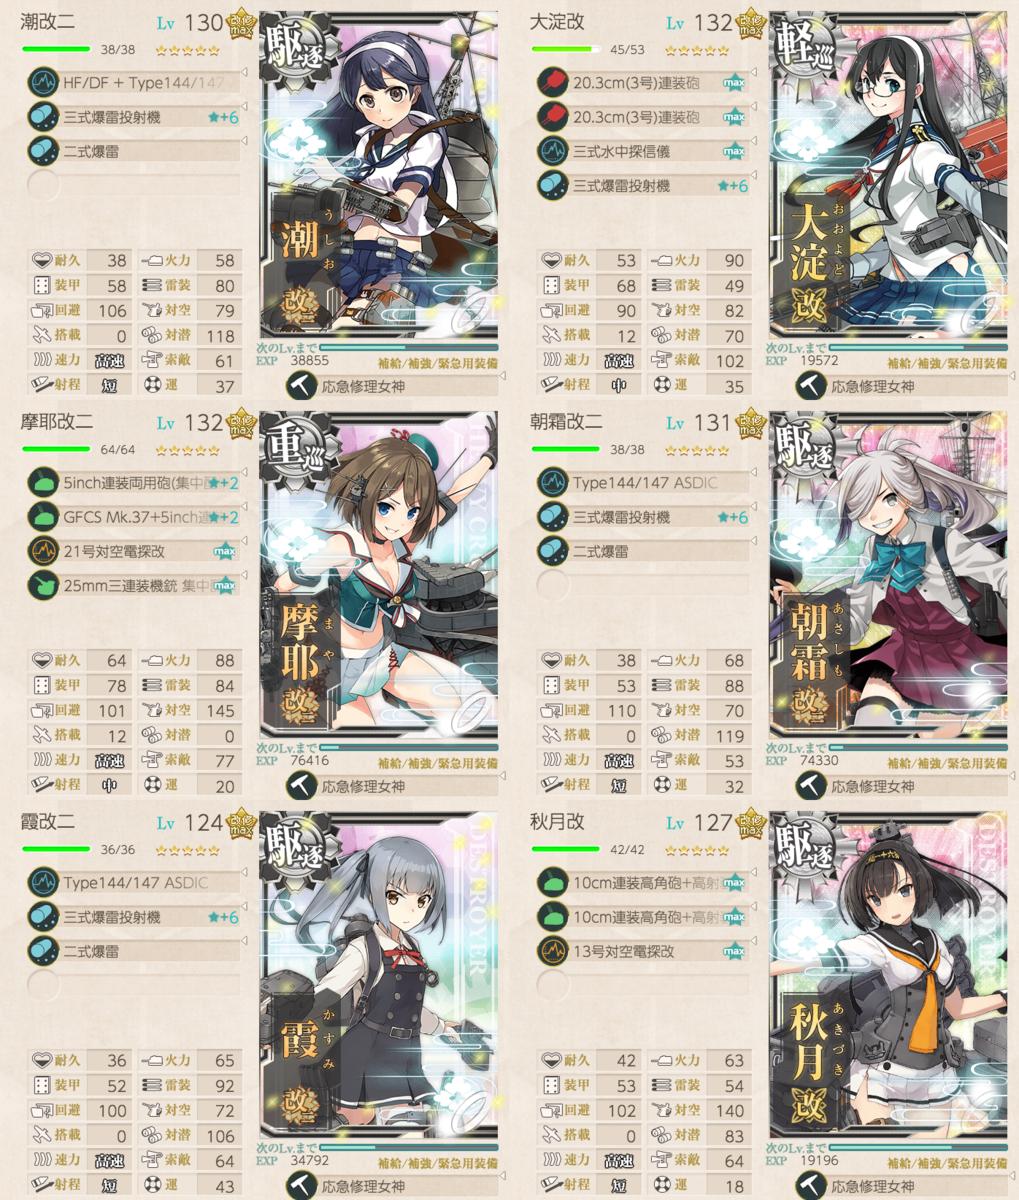 f:id:nameless_admiral:20200307124354p:plain